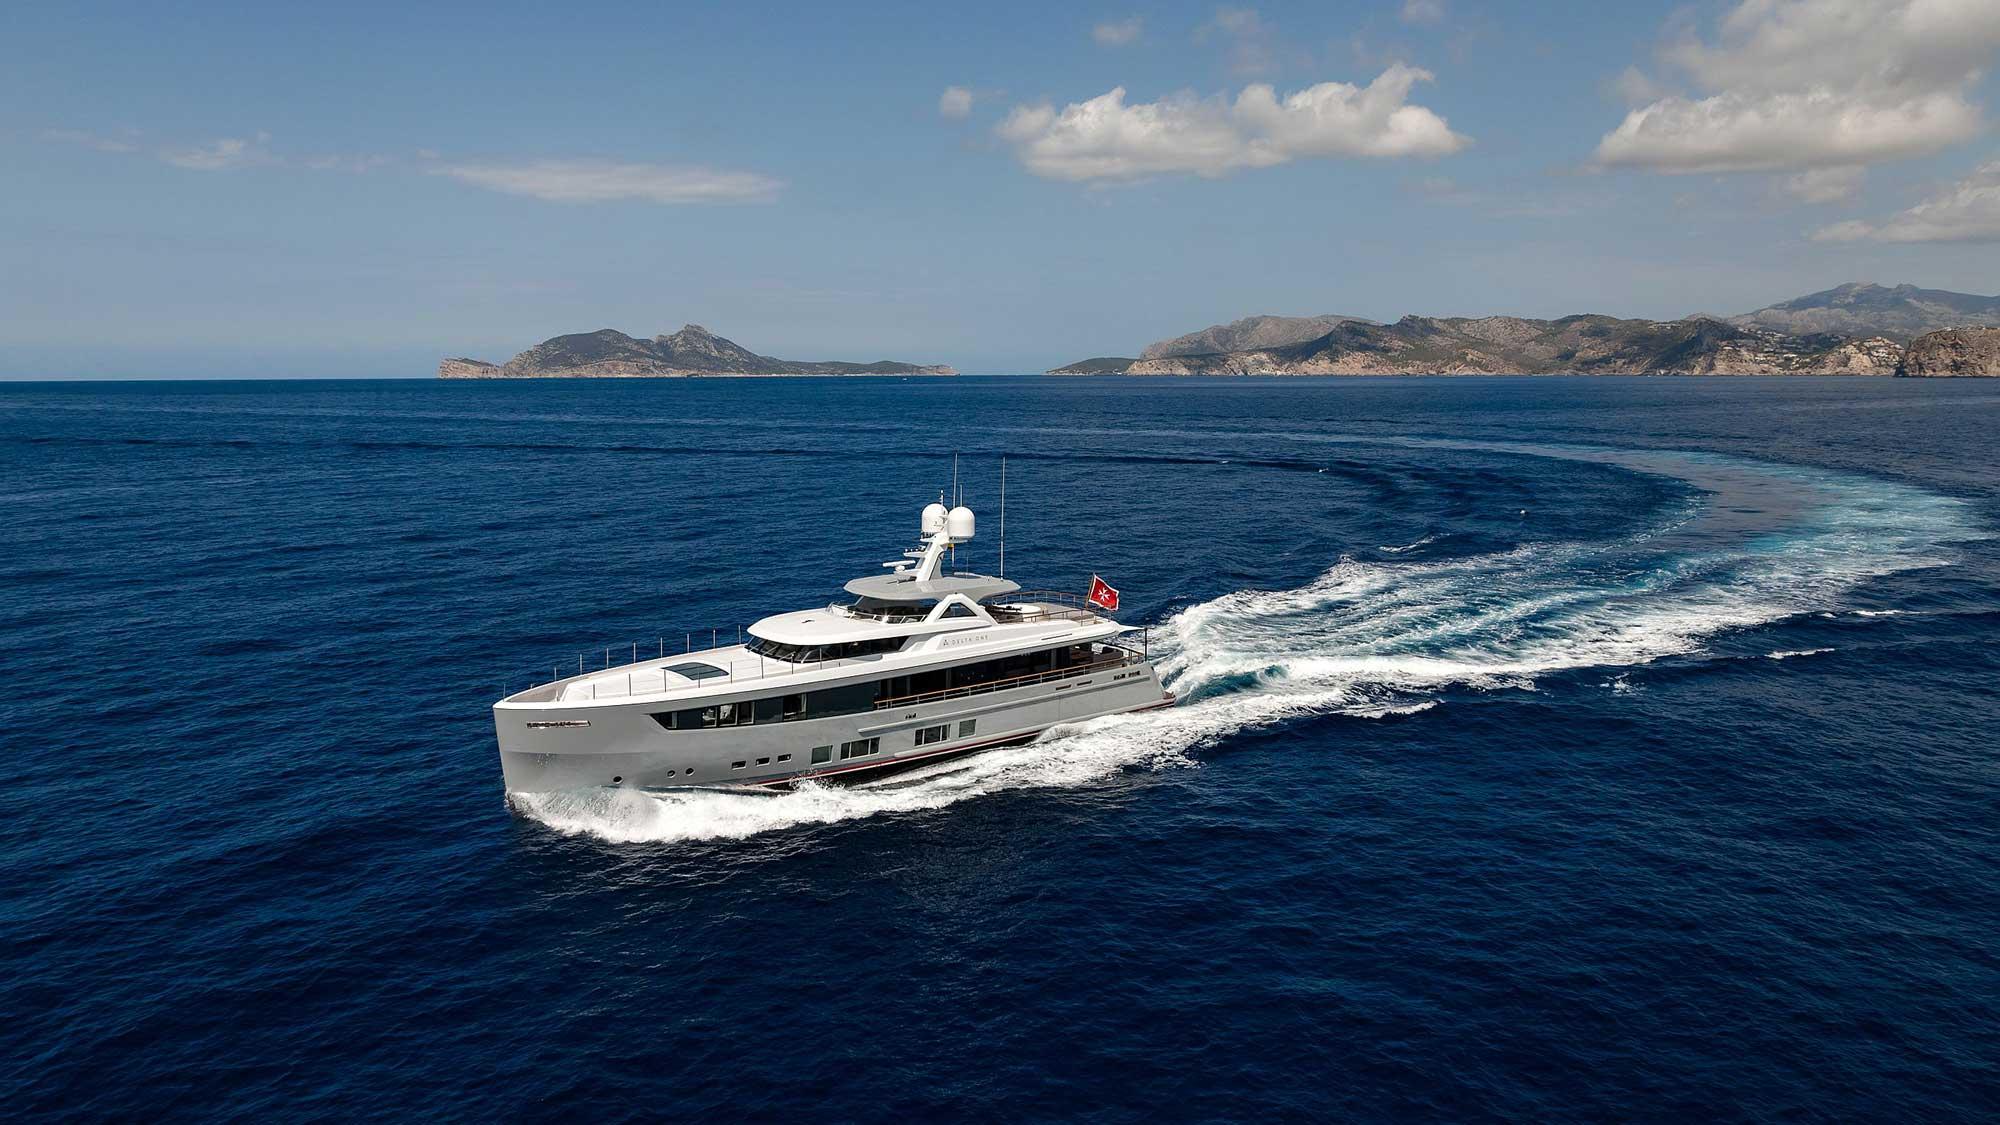 DELTA ONE Yacht Charter Details Mulder Yachts